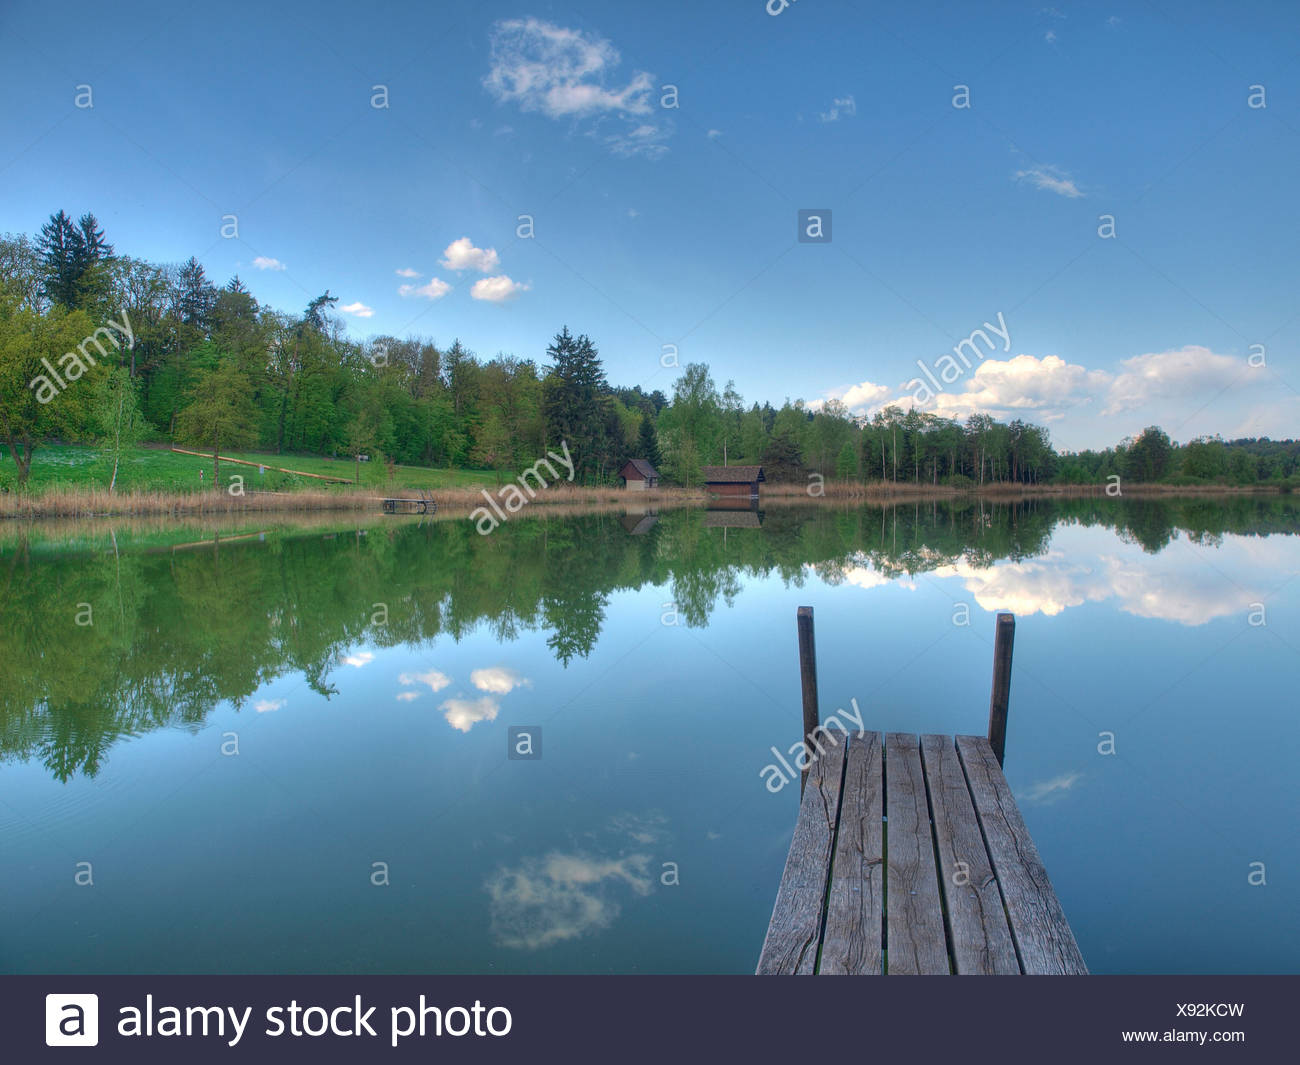 Blue, spring, himmel, idyl, footbridge, lake, wood, forest, water, clouds, canton Zurich, Switzerland, Husemersee, lake, Ossinge - Stock Image